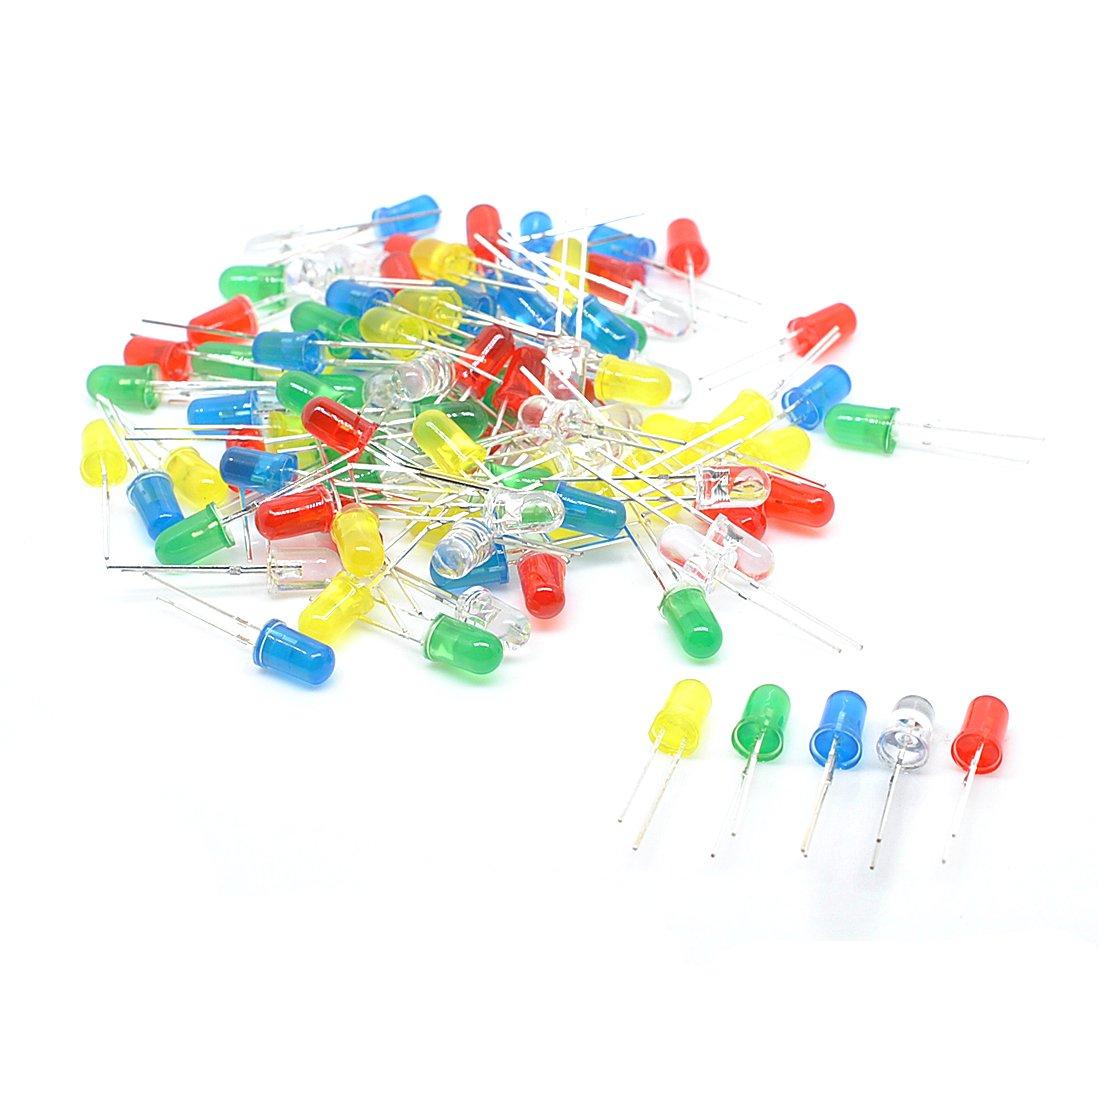 willwin 100pcs 3 mm varios colores LED diodos emisores de luz DC 3 V 20 mA 5 colores Resistencia Kit 4330585583